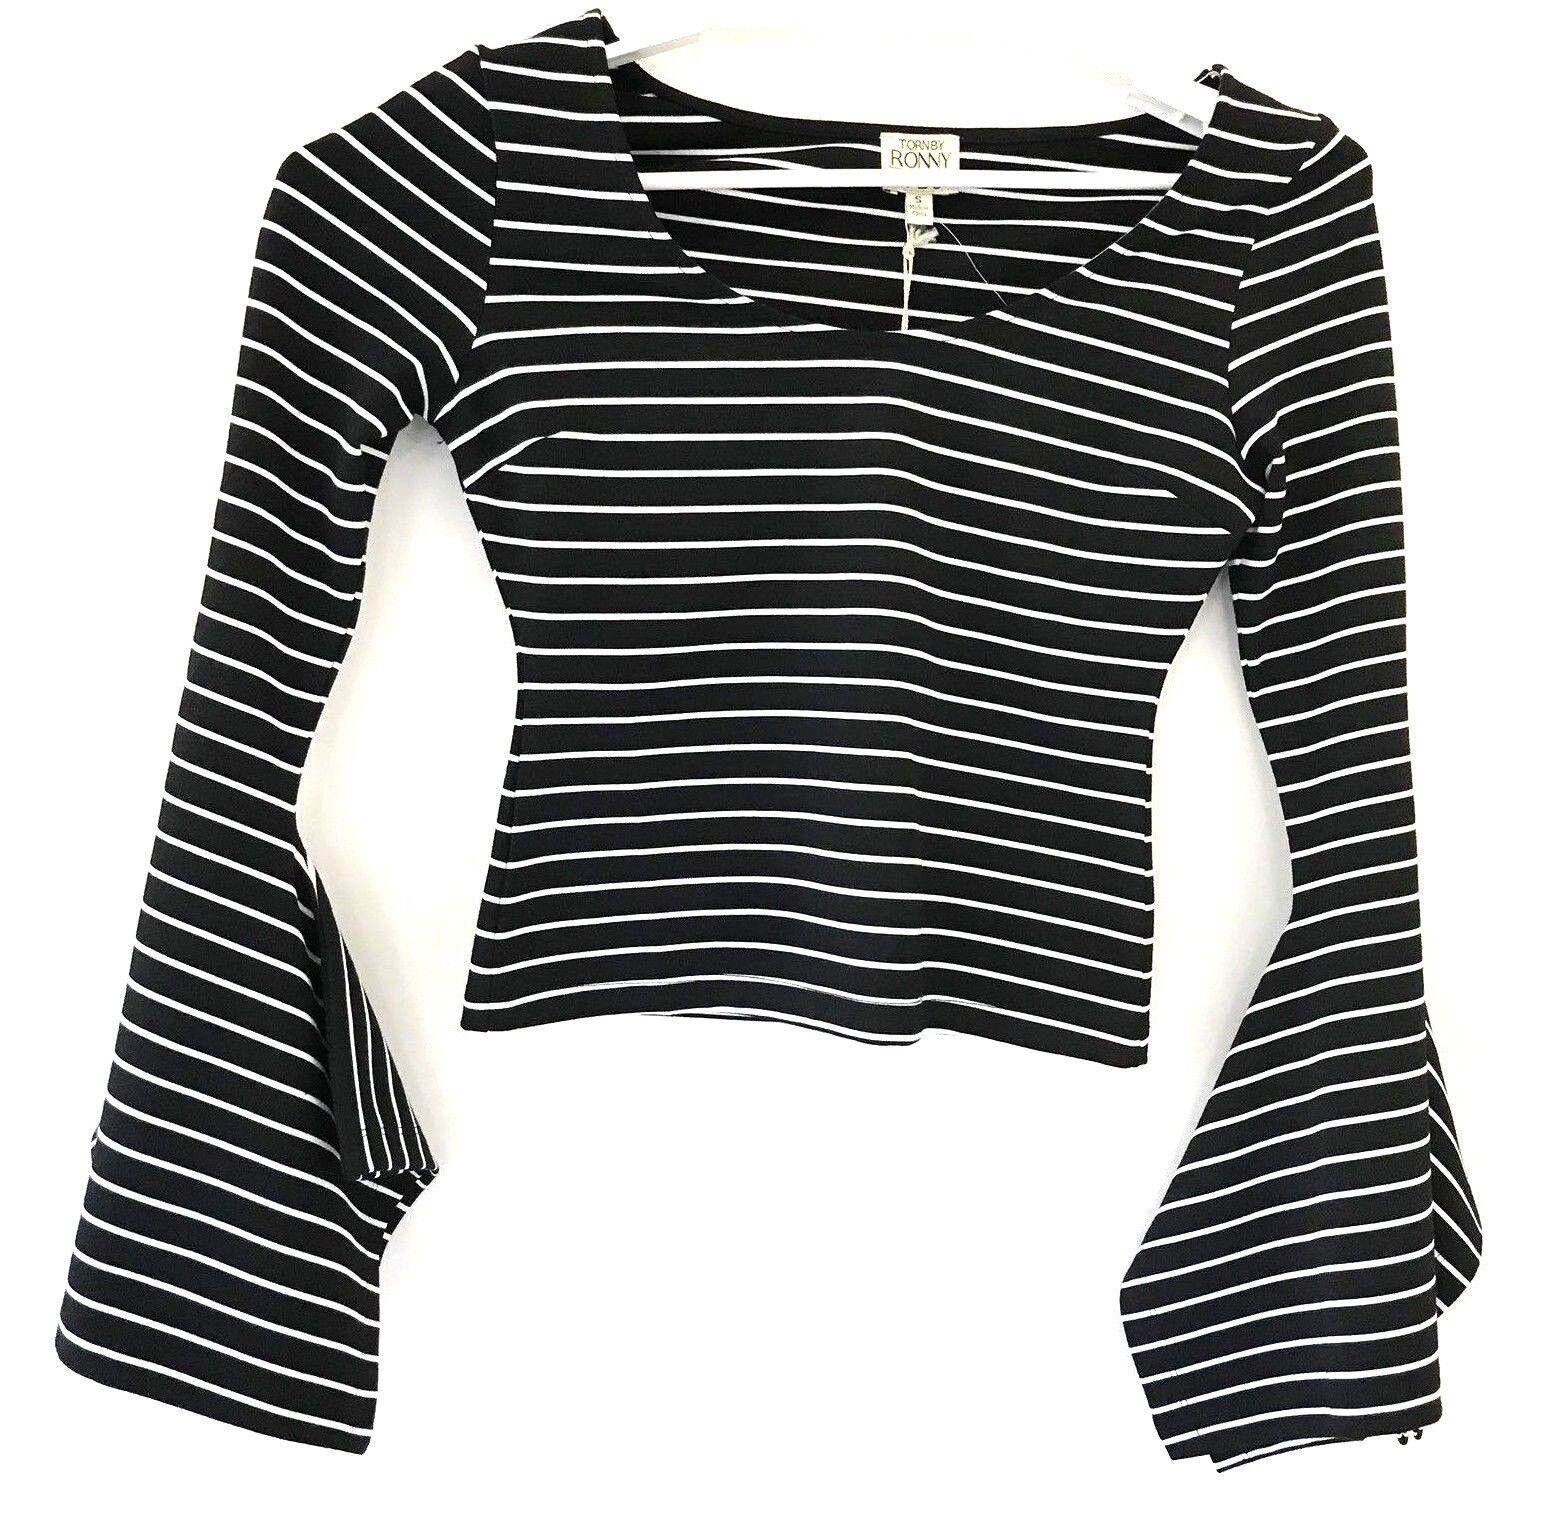 Torn by Ronny Kobo Bell Sleeves Striped schwarz Weiß Crop Top Größe X Small